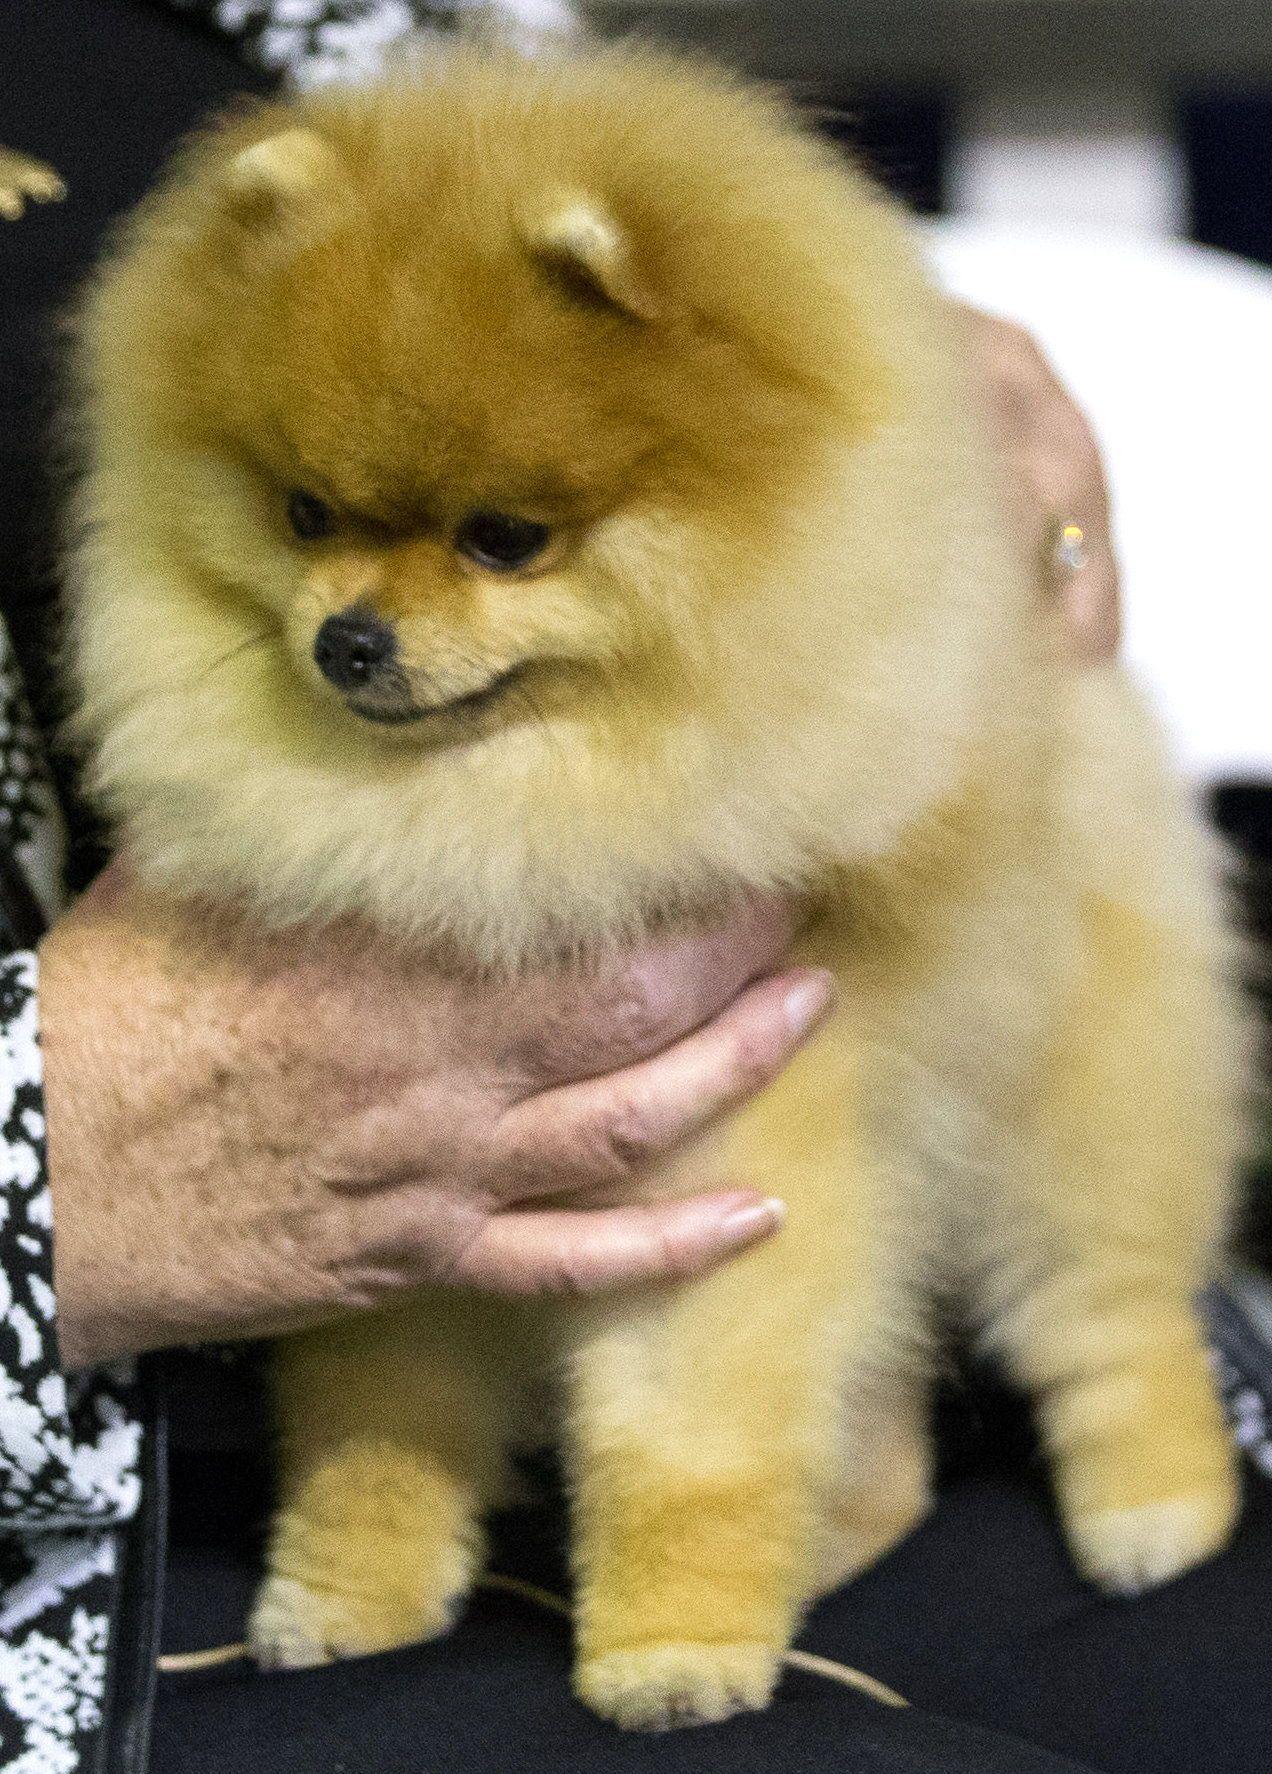 Champion Dochlaggie Deagol The Hobbit As A Puppy Pomeranian Puppy Pomeranian Dog Pomeranian